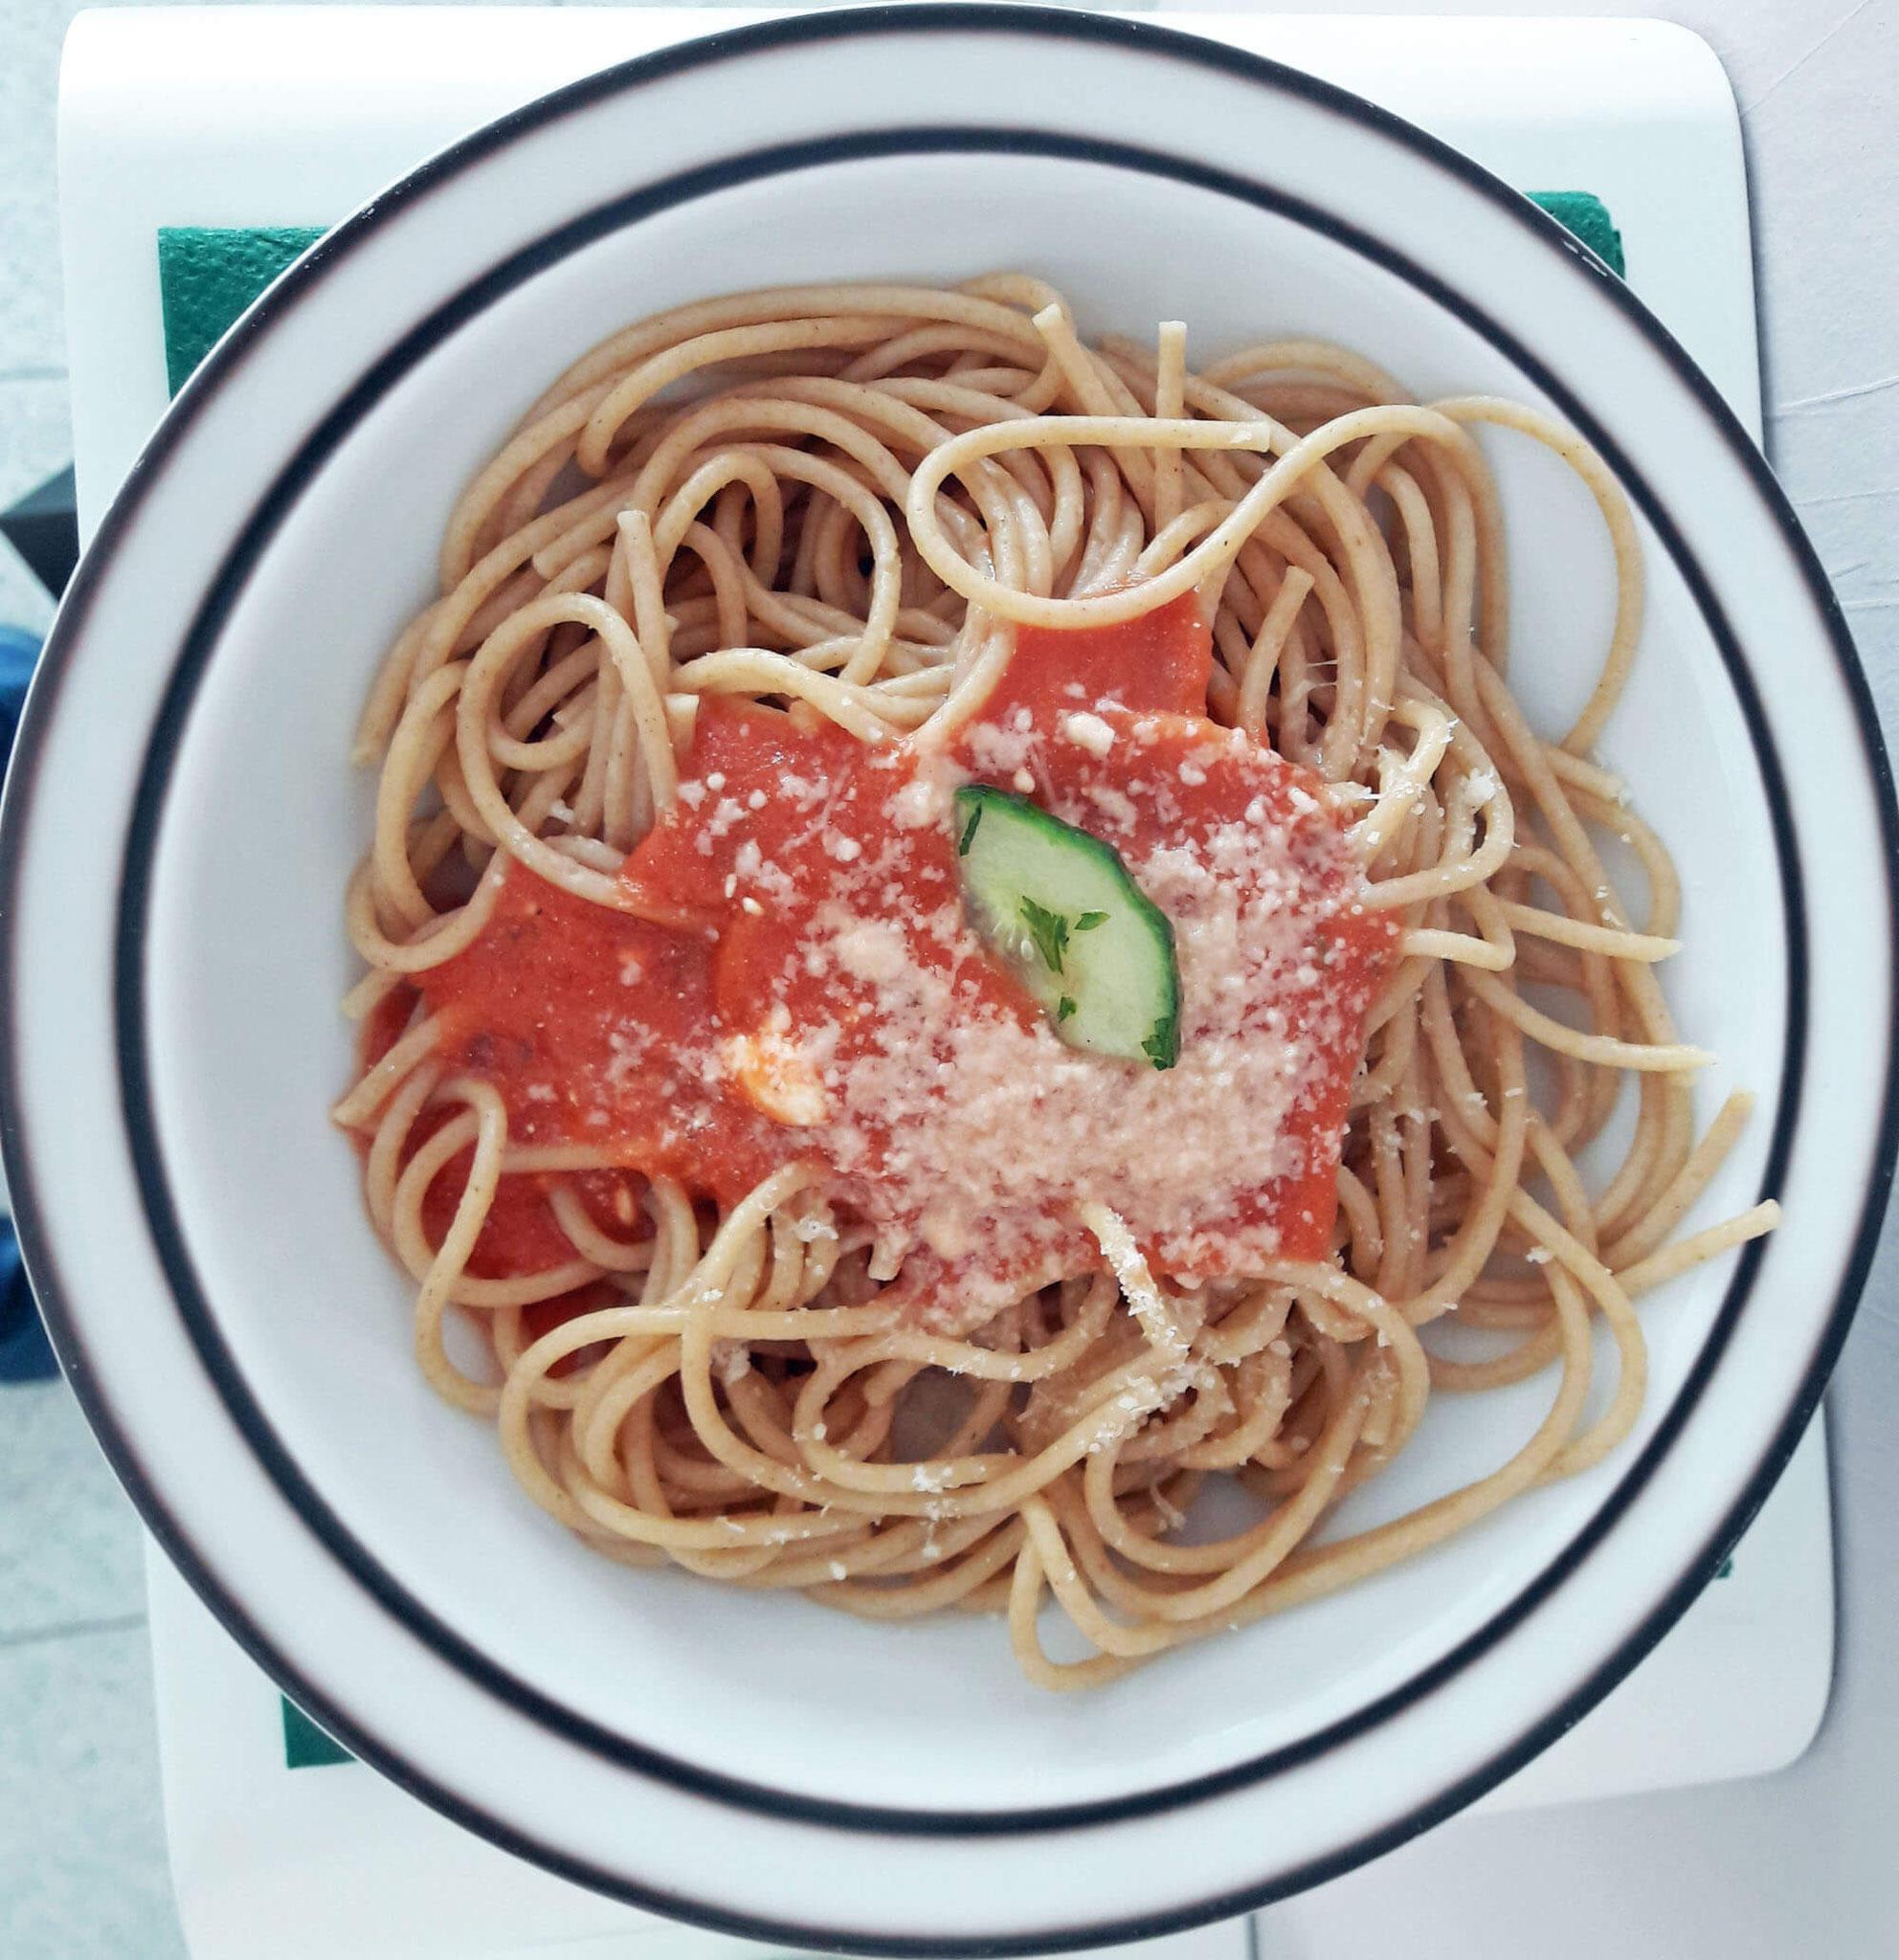 13b Hauptspeise_Spaghetti, Ute Both #tagdernachbarn